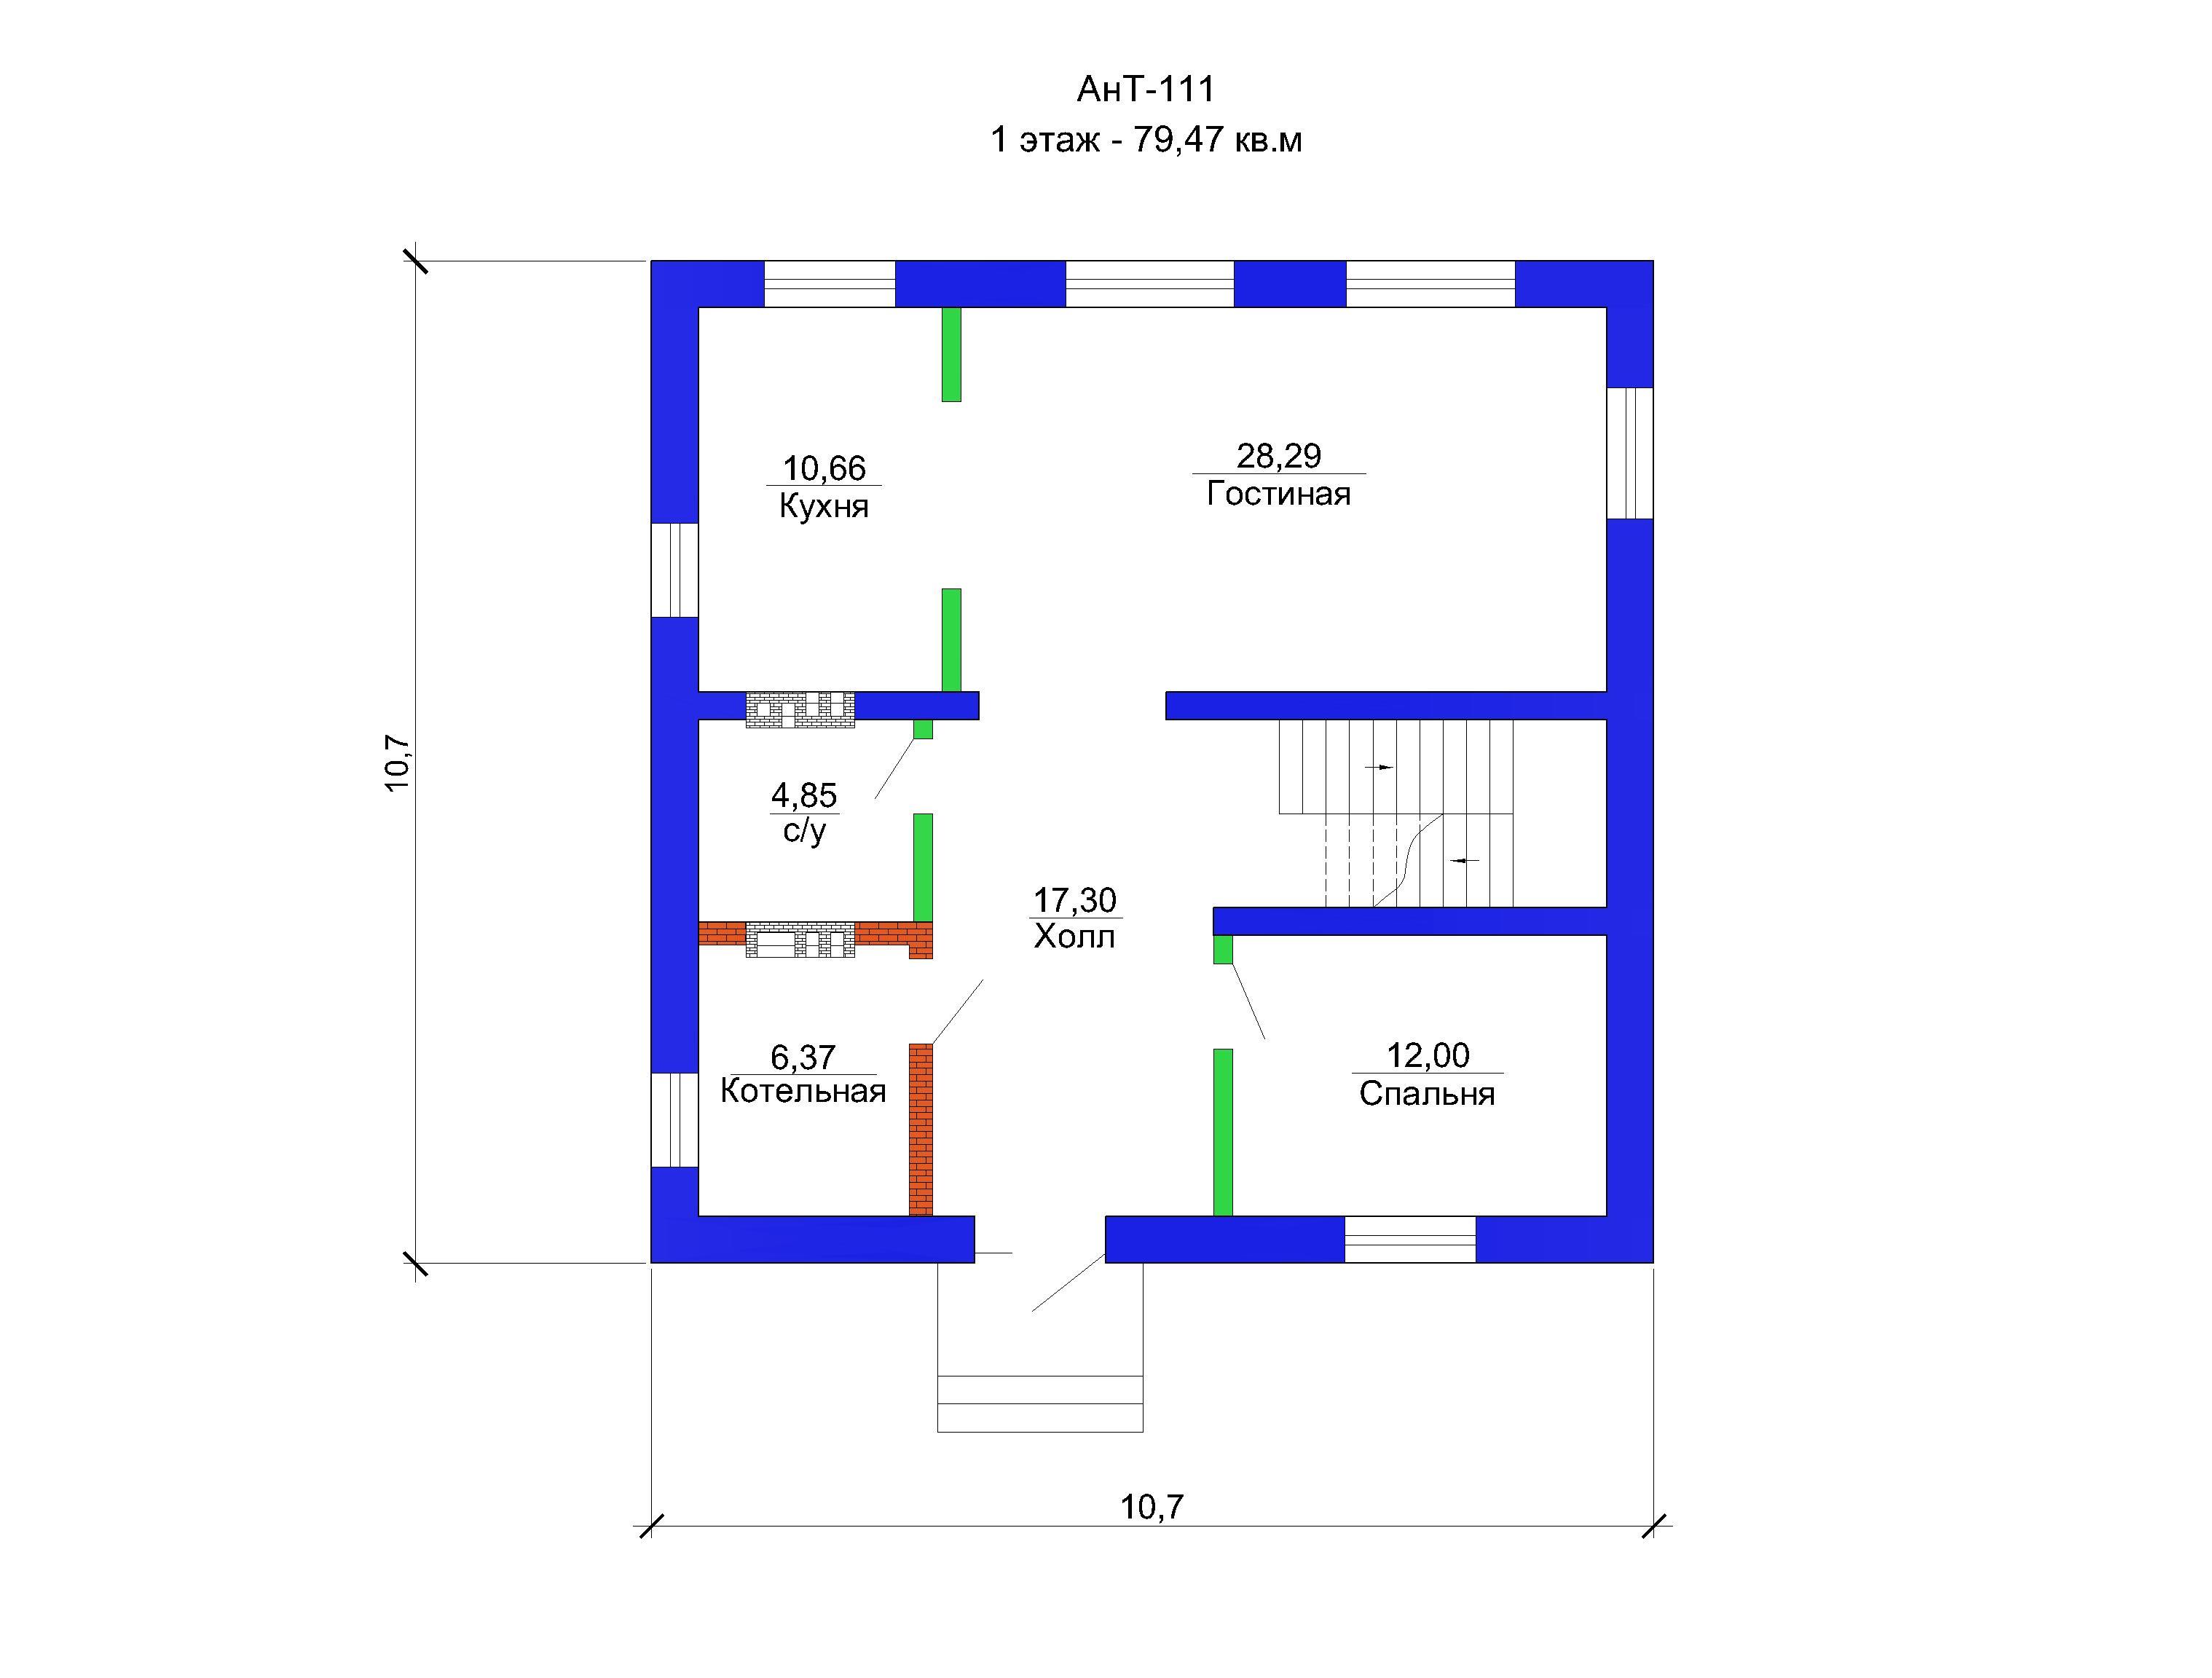 Готовый проект дома 160 кв.м / Артикул AHT-111 план